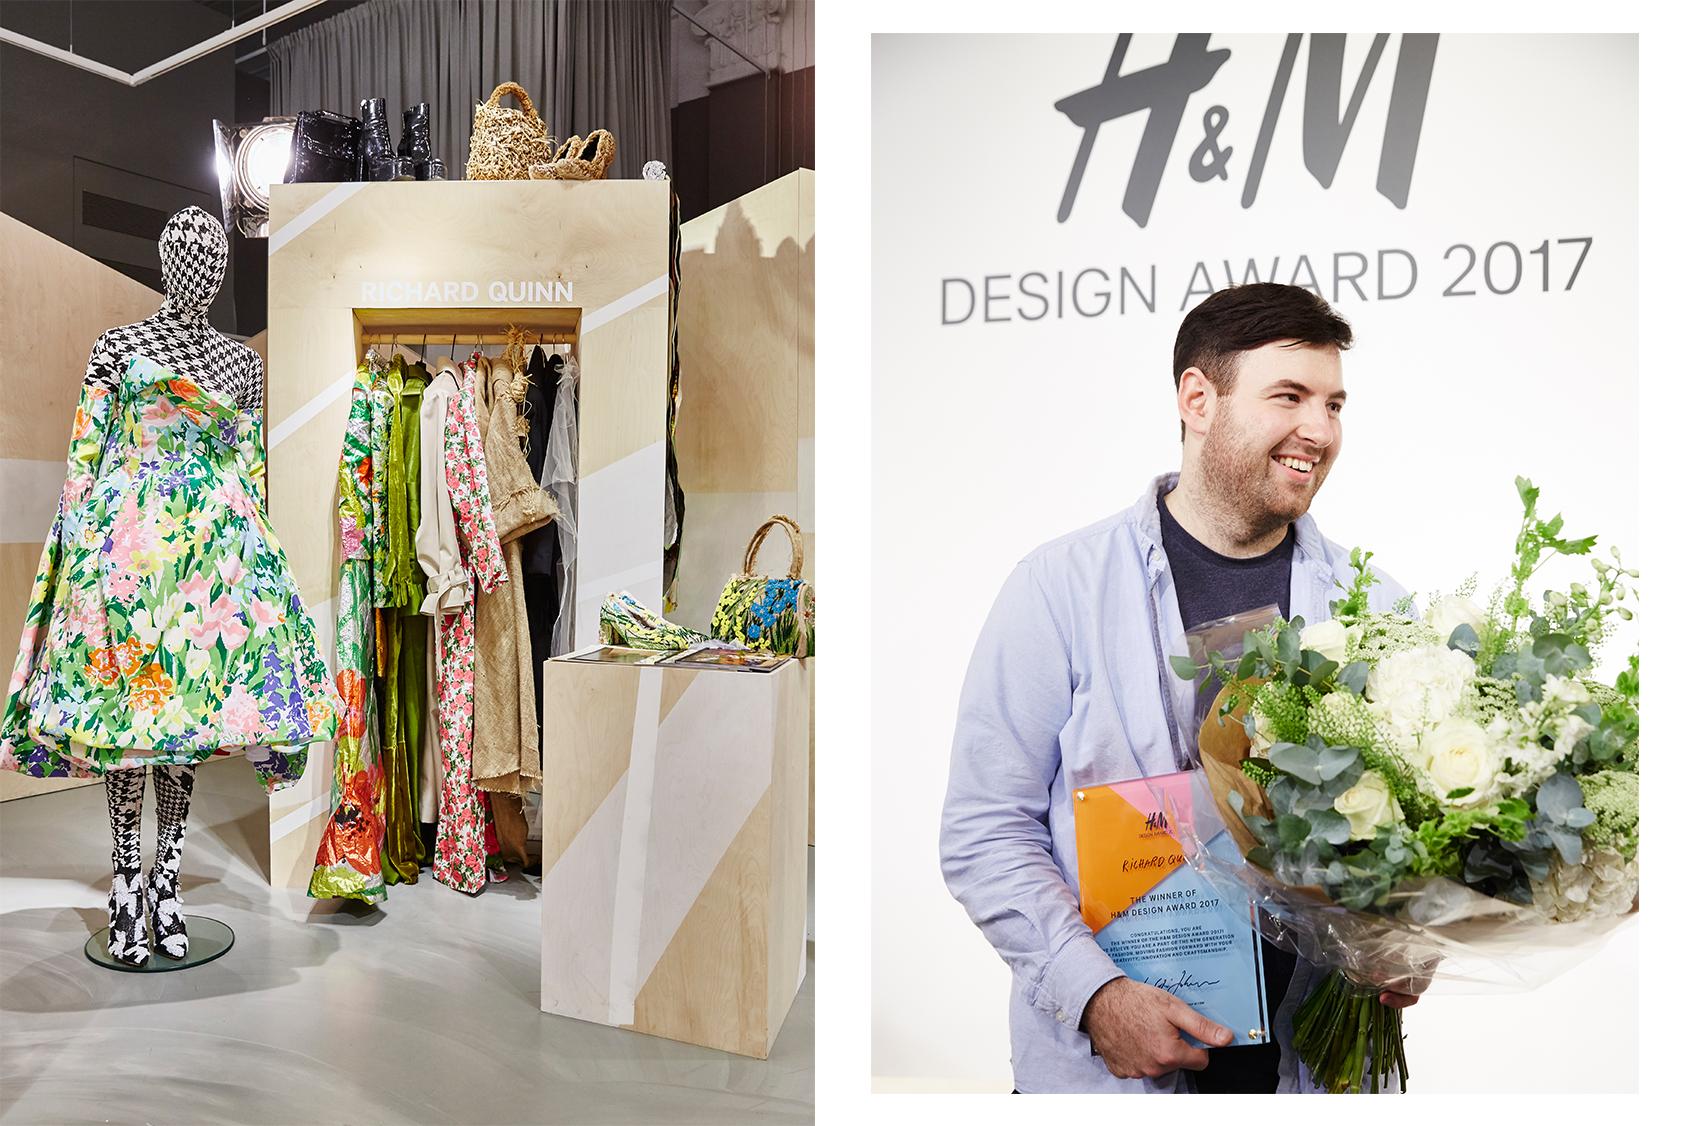 Richard Quinn wins the H&M Design Award 2017_1